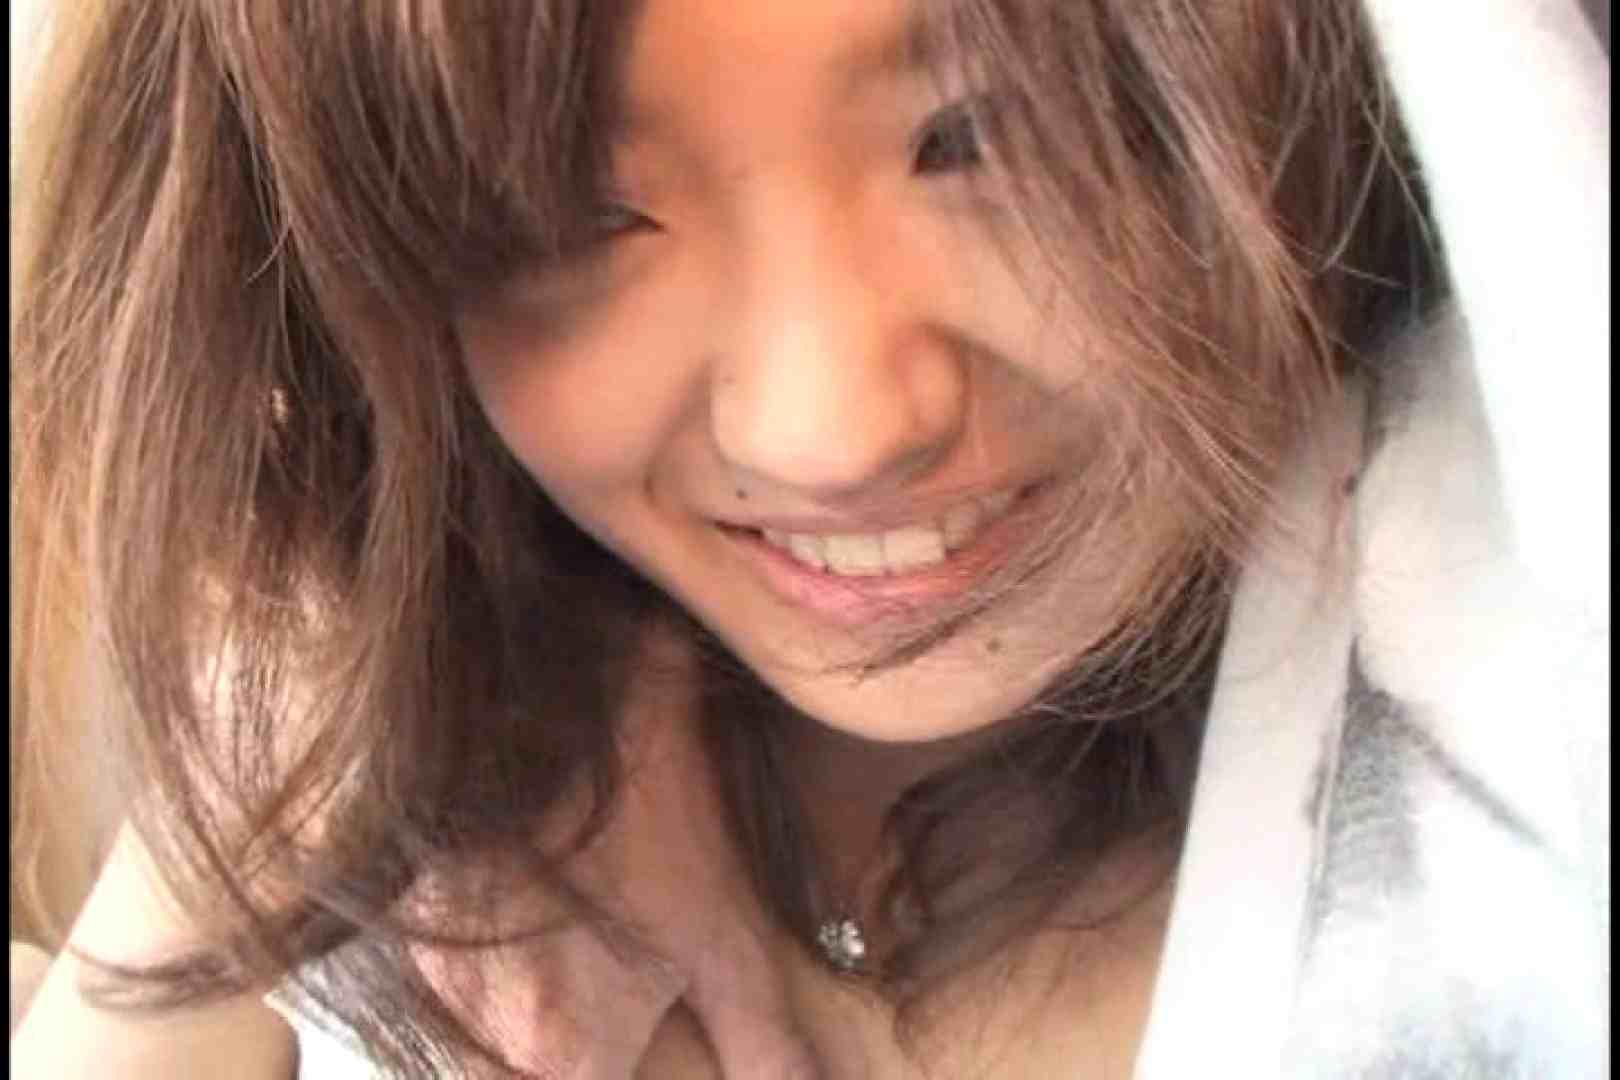 JDハンター全国ツアー vol.035 前編 女子大生のエロ動画  110PIX 66